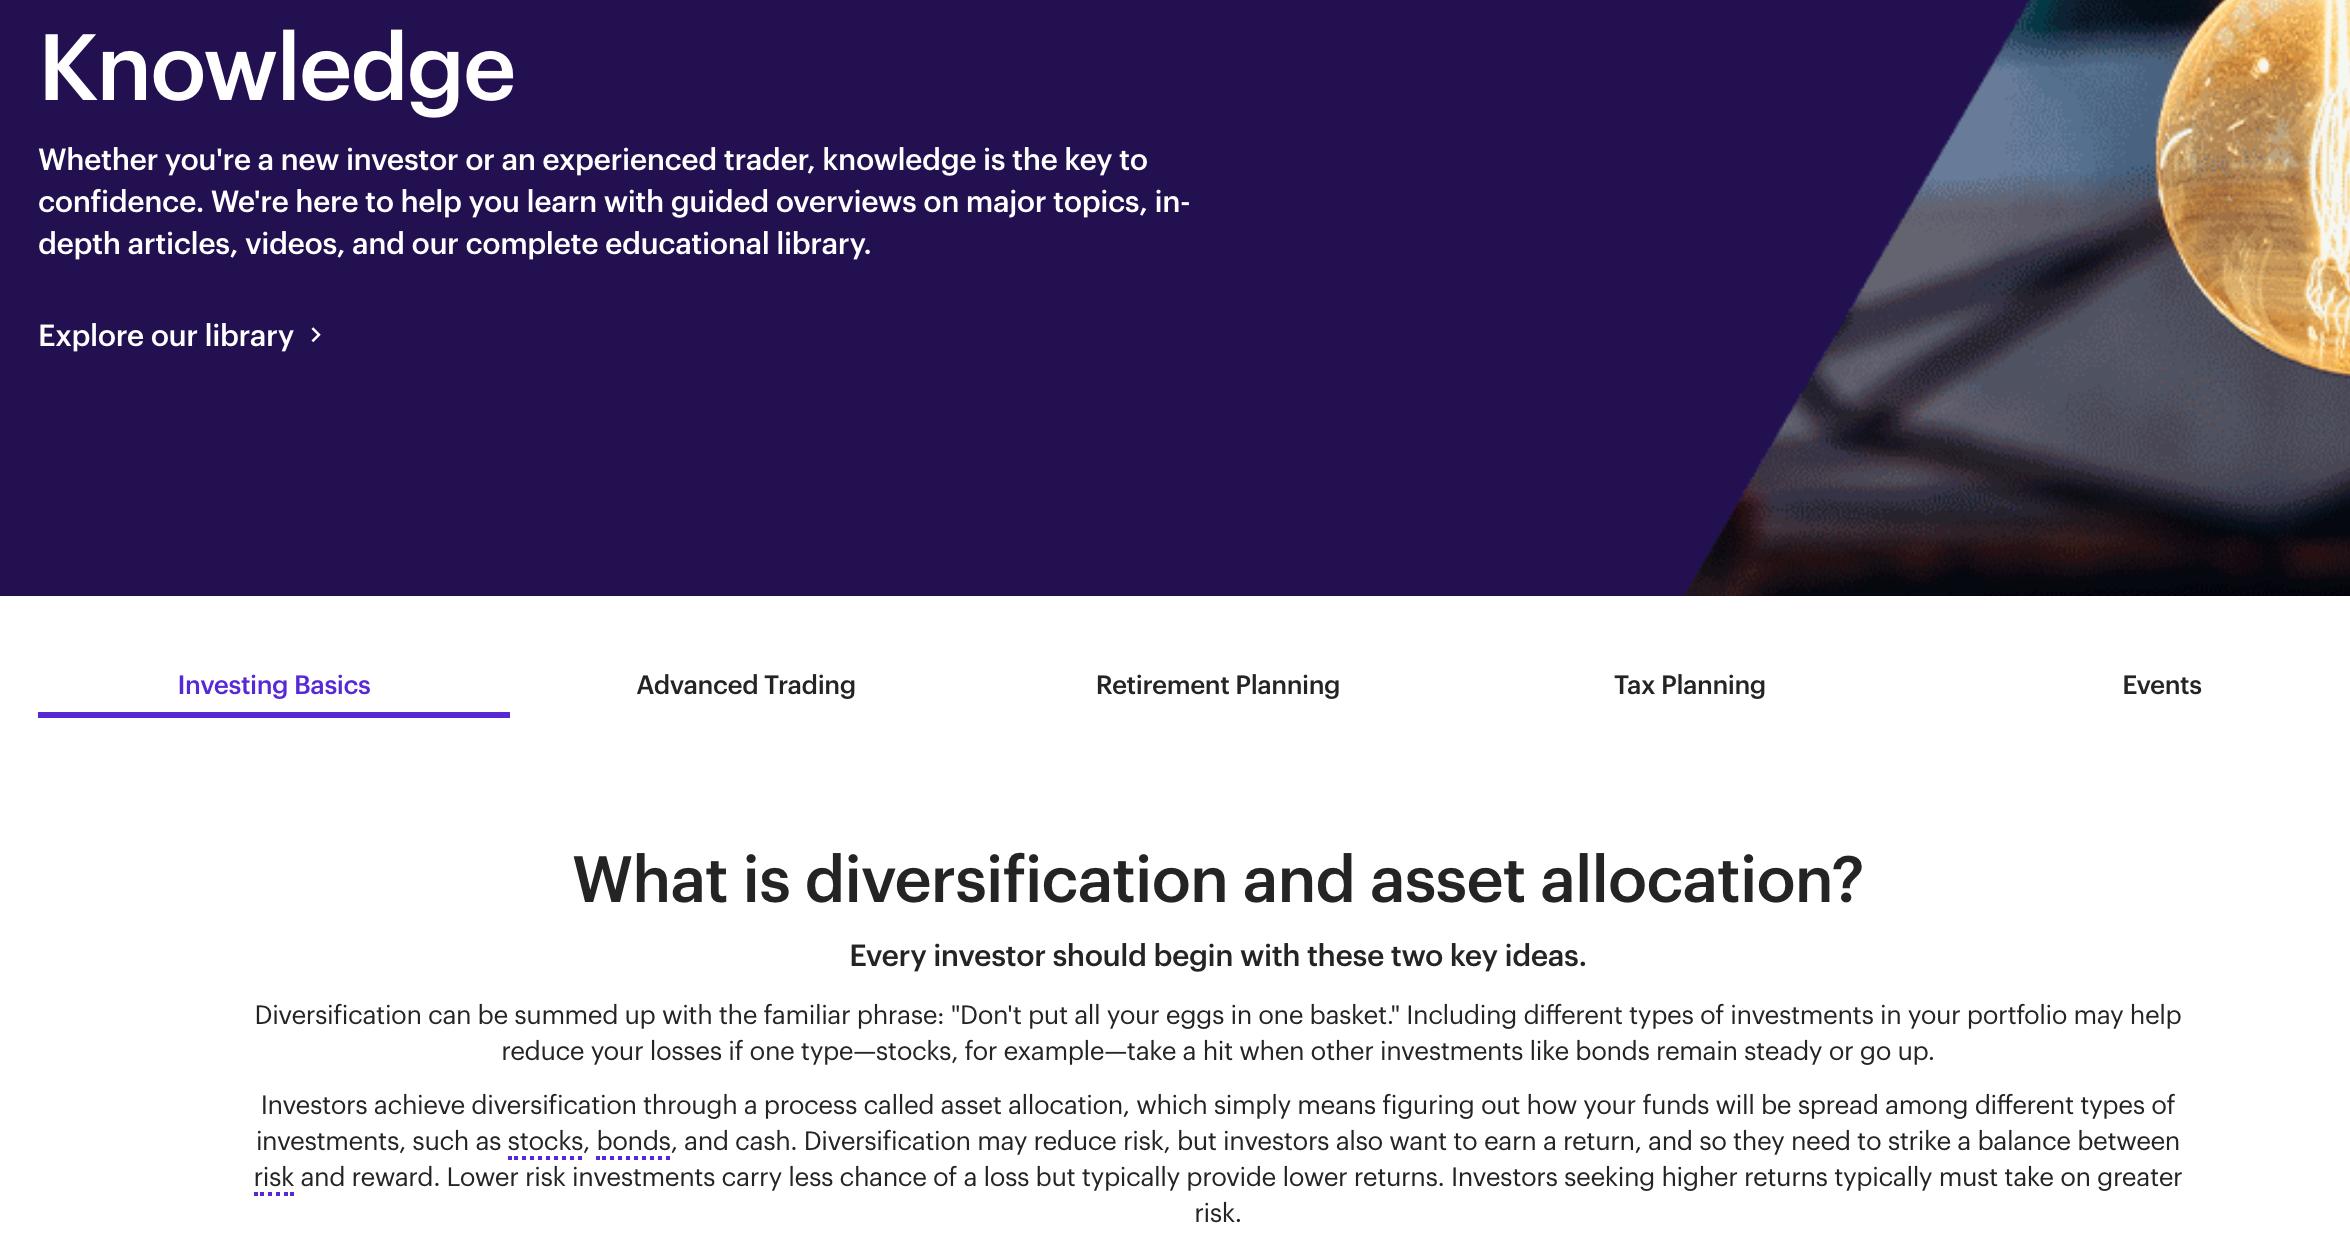 E*Trader education